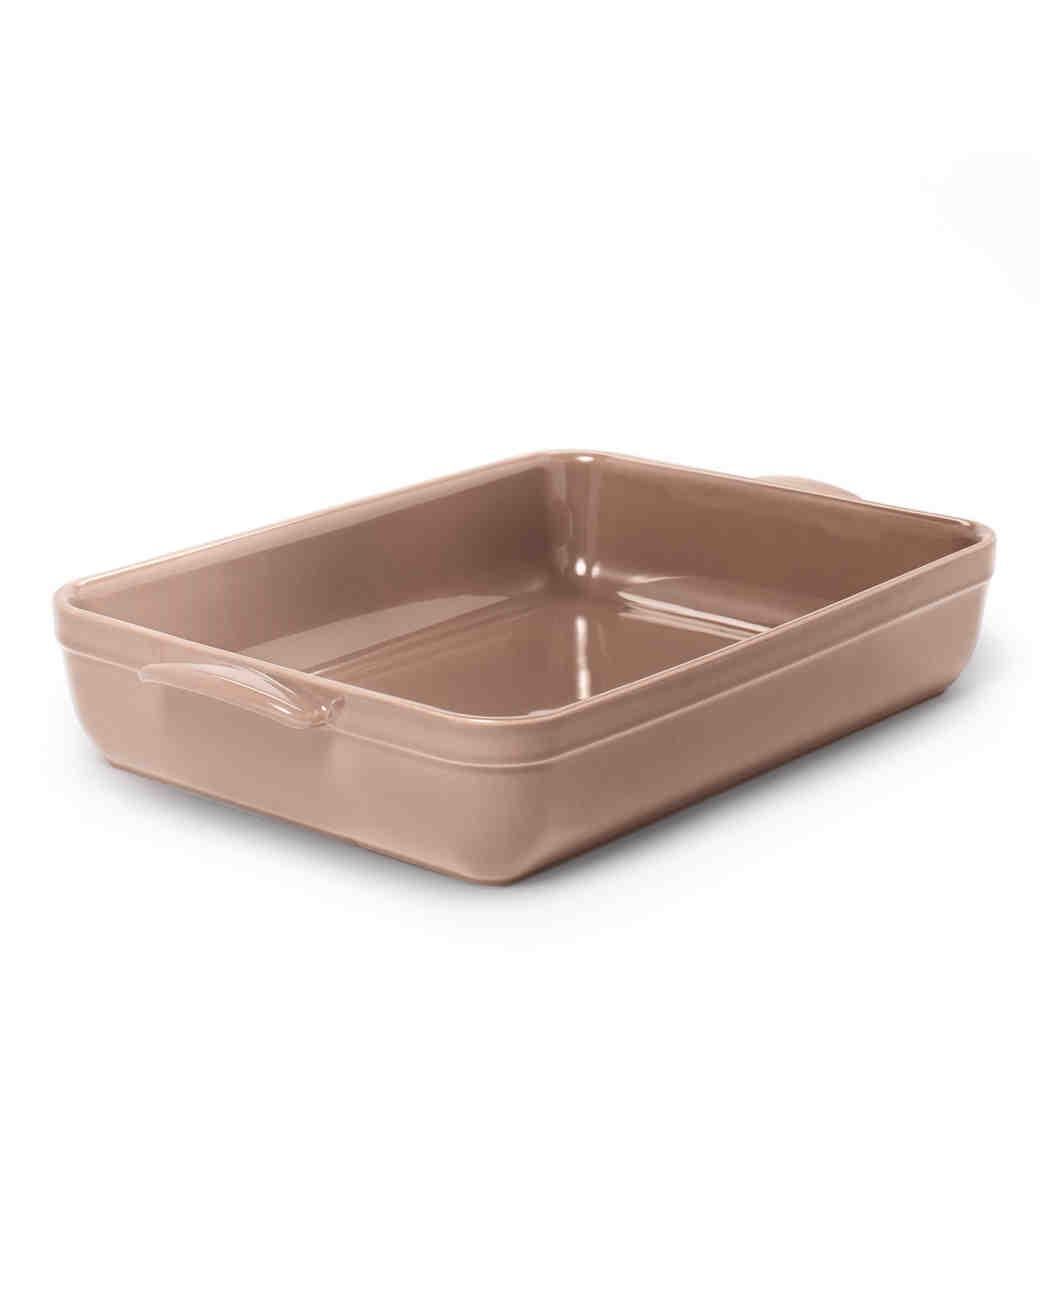 ceramic-casserole-424-mwd110609.jpg